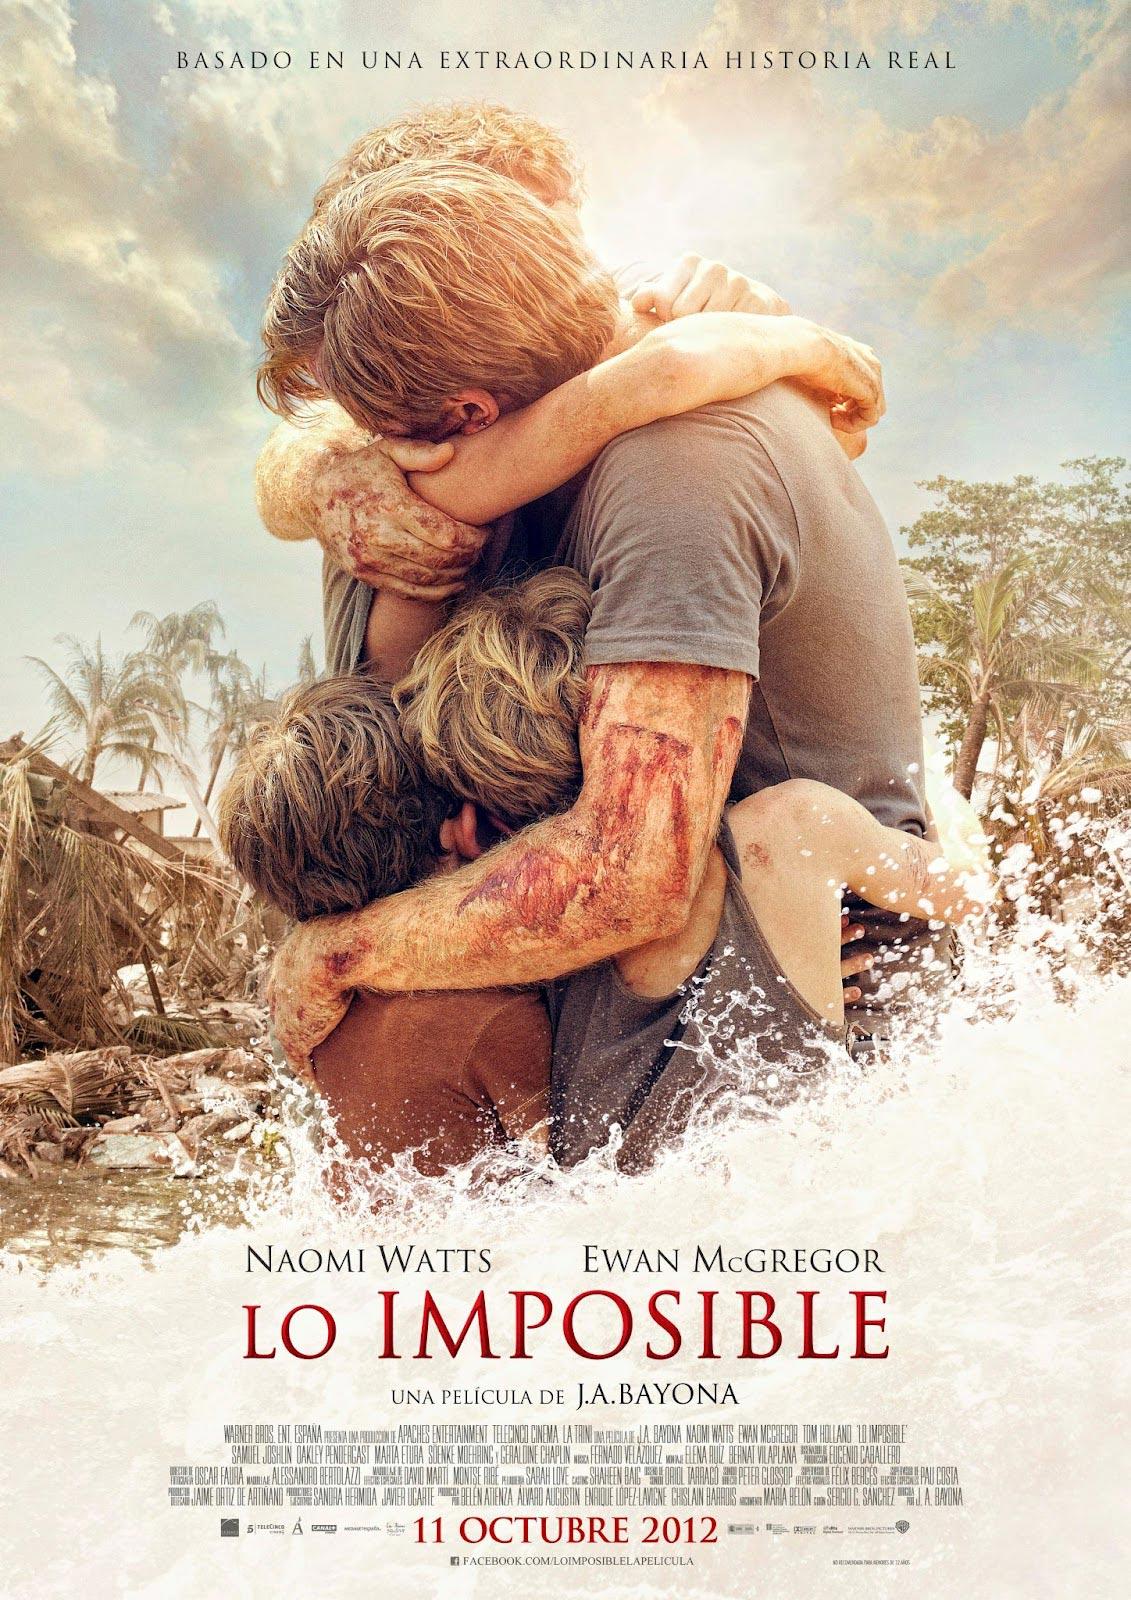 http://3.bp.blogspot.com/-G7NHdJkz3bo/UP9UltszBKI/AAAAAAAAAmQ/IqAUMr17dMk/s1600/The-Impossible-Poster.jpg